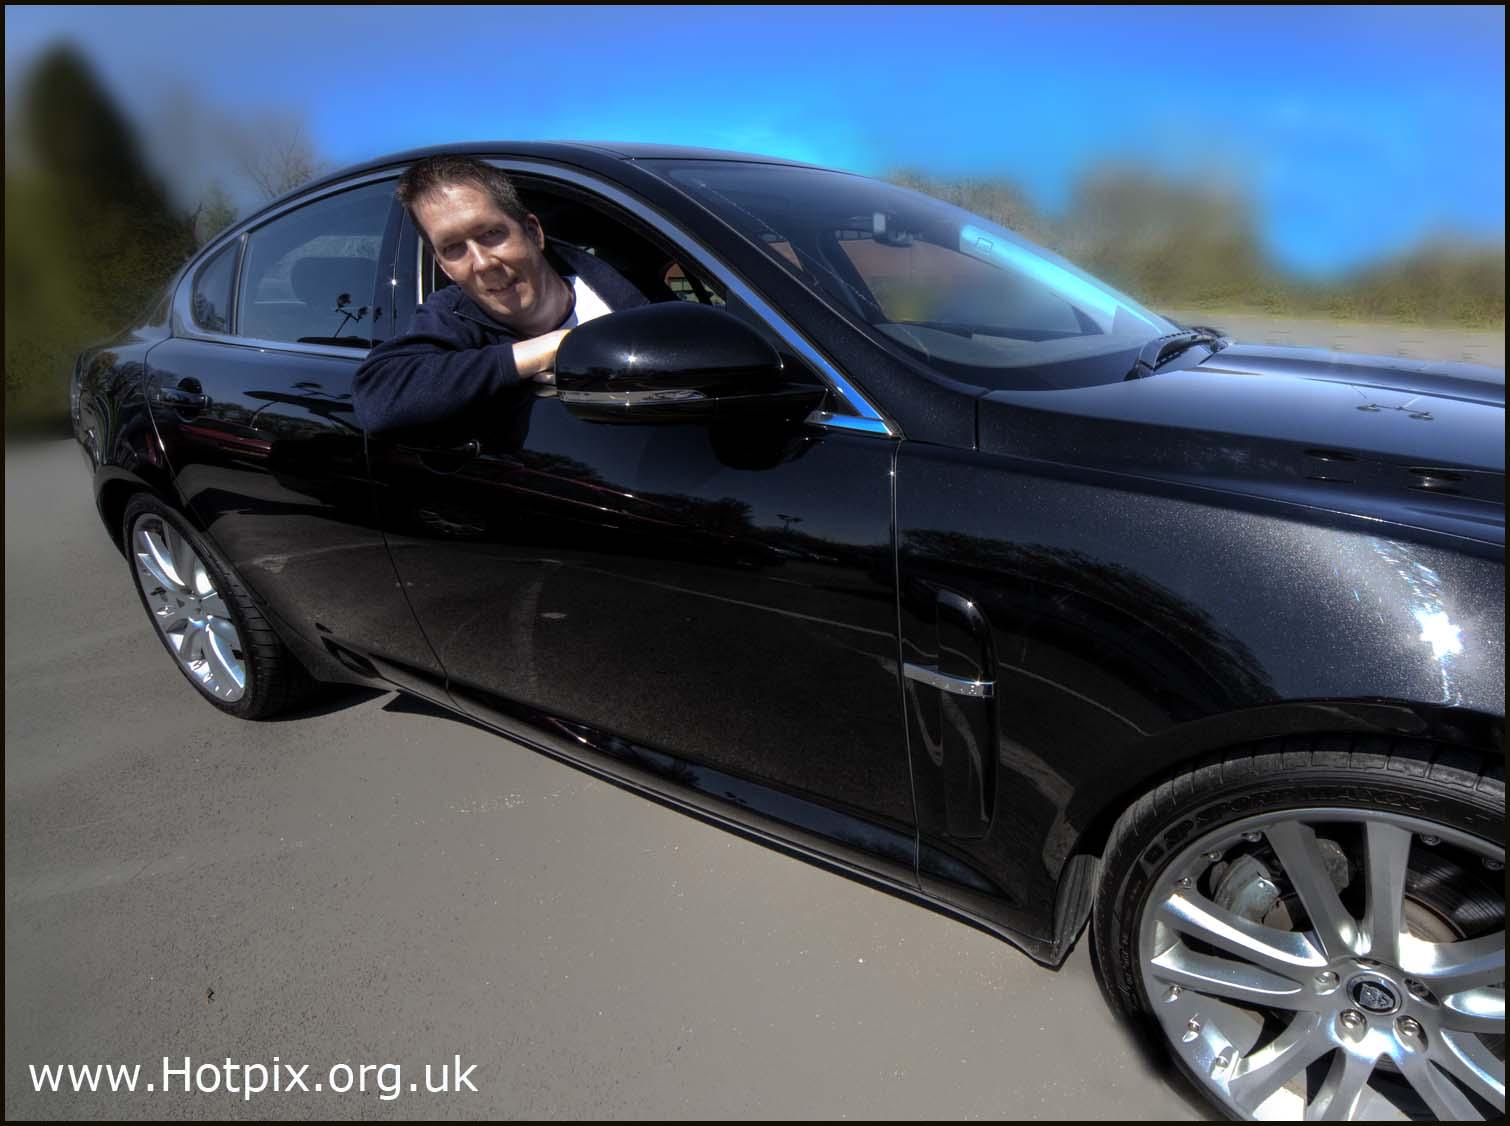 jaguar,vehicle,car,racing,black,automobile,al,alastair,wheels,tata,auto,raod,roadster,heaton,northwich,cheshire,england,gb,britain,great,uk,united,kingdom,onysmith,hotpix,hotpixuk,autos,automobiles,vehicles,interesting,people,person,persons,persona,interesante,wide,angle,wideangle,lens,sigma,12-24mm,10-20mm,hotpix.rocketmail.com,hotpixuk.rocketmail.com,contact.tony.smith.gmail.com,tony.smith.gmail.com,tonys@miscs.com,tony.smith@mis-ams.com